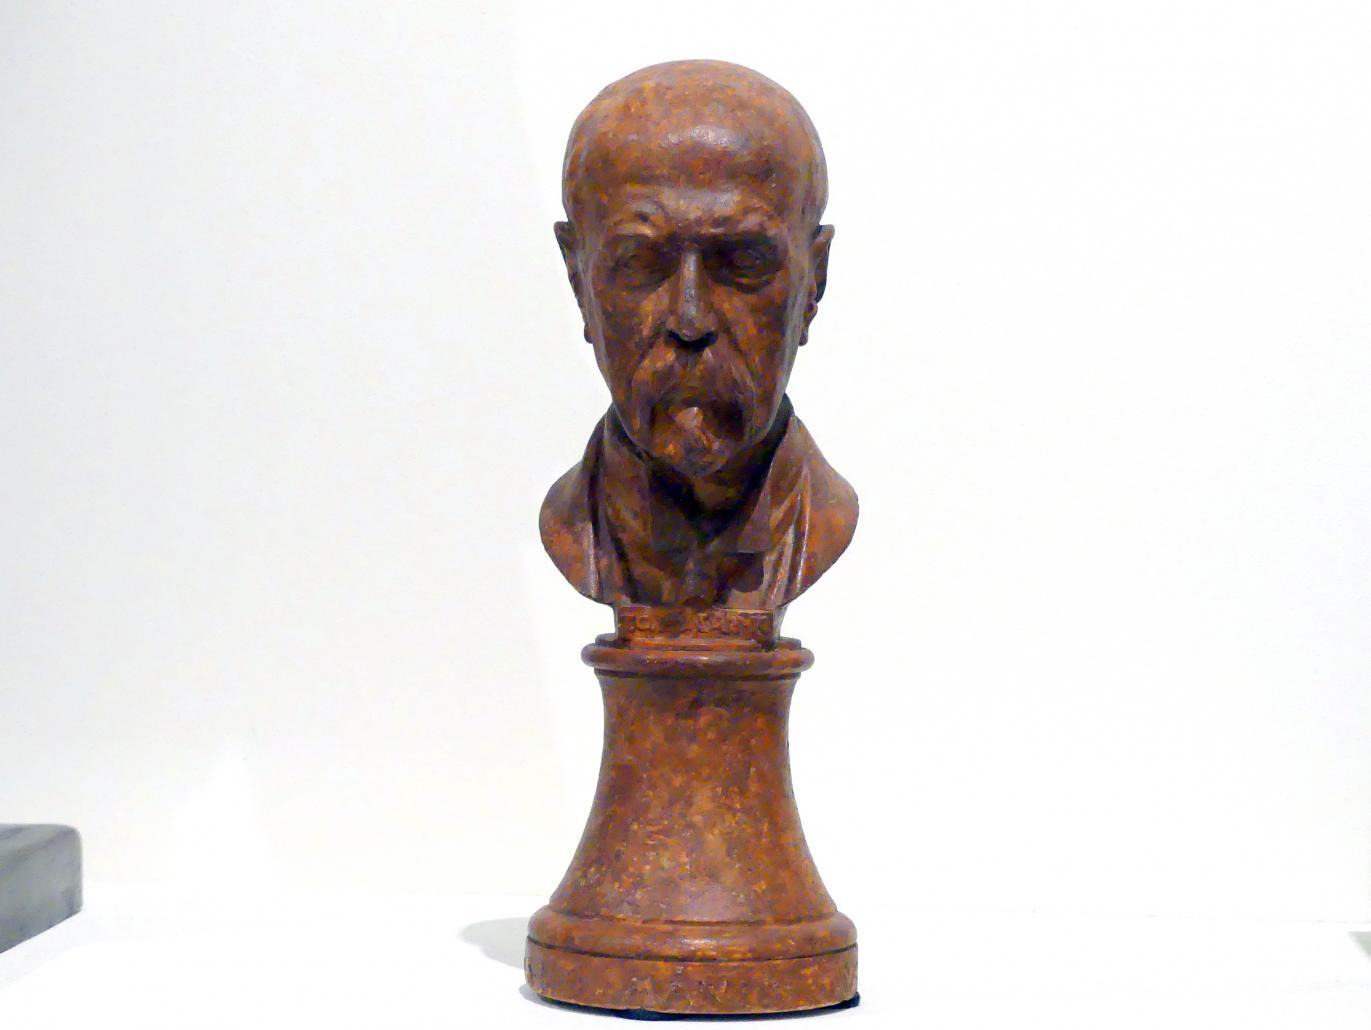 Jan Štursa: Büste Tomáš Garrigue Masaryk, 1921